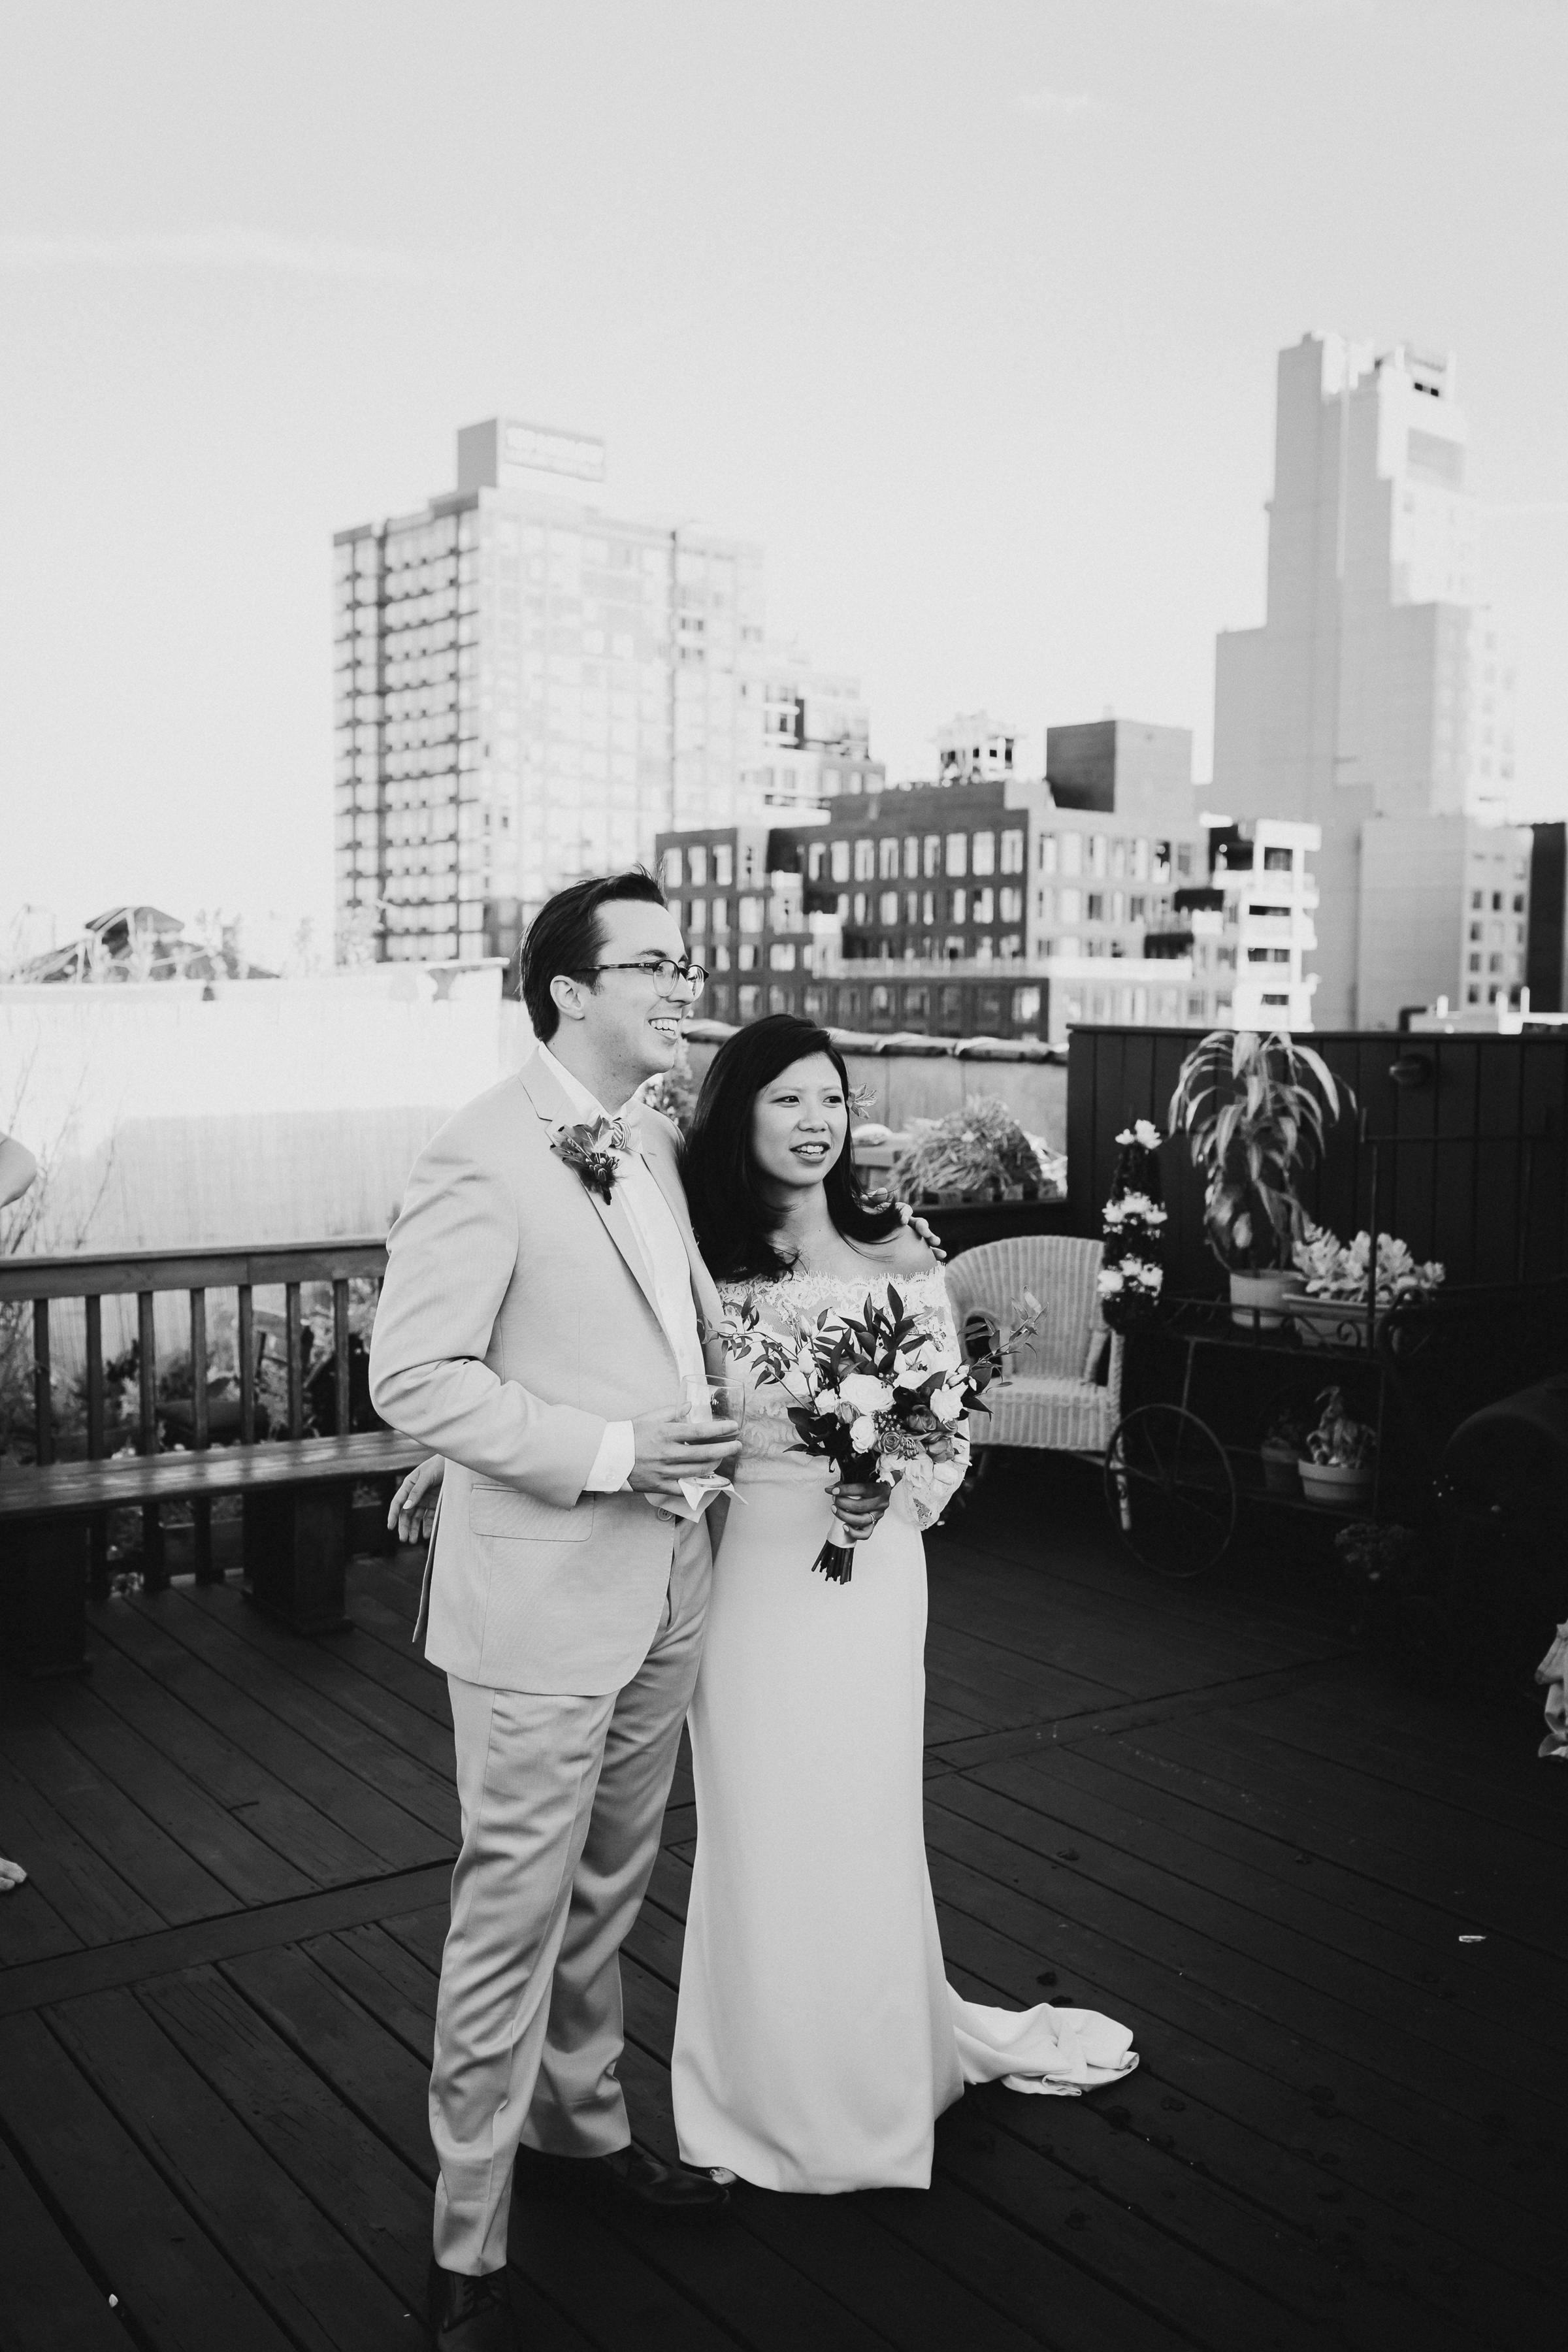 The-Bhakti-Center-Yoga-NYC-Rooftop-Documentary-Wedding-Photographer-47.jpg